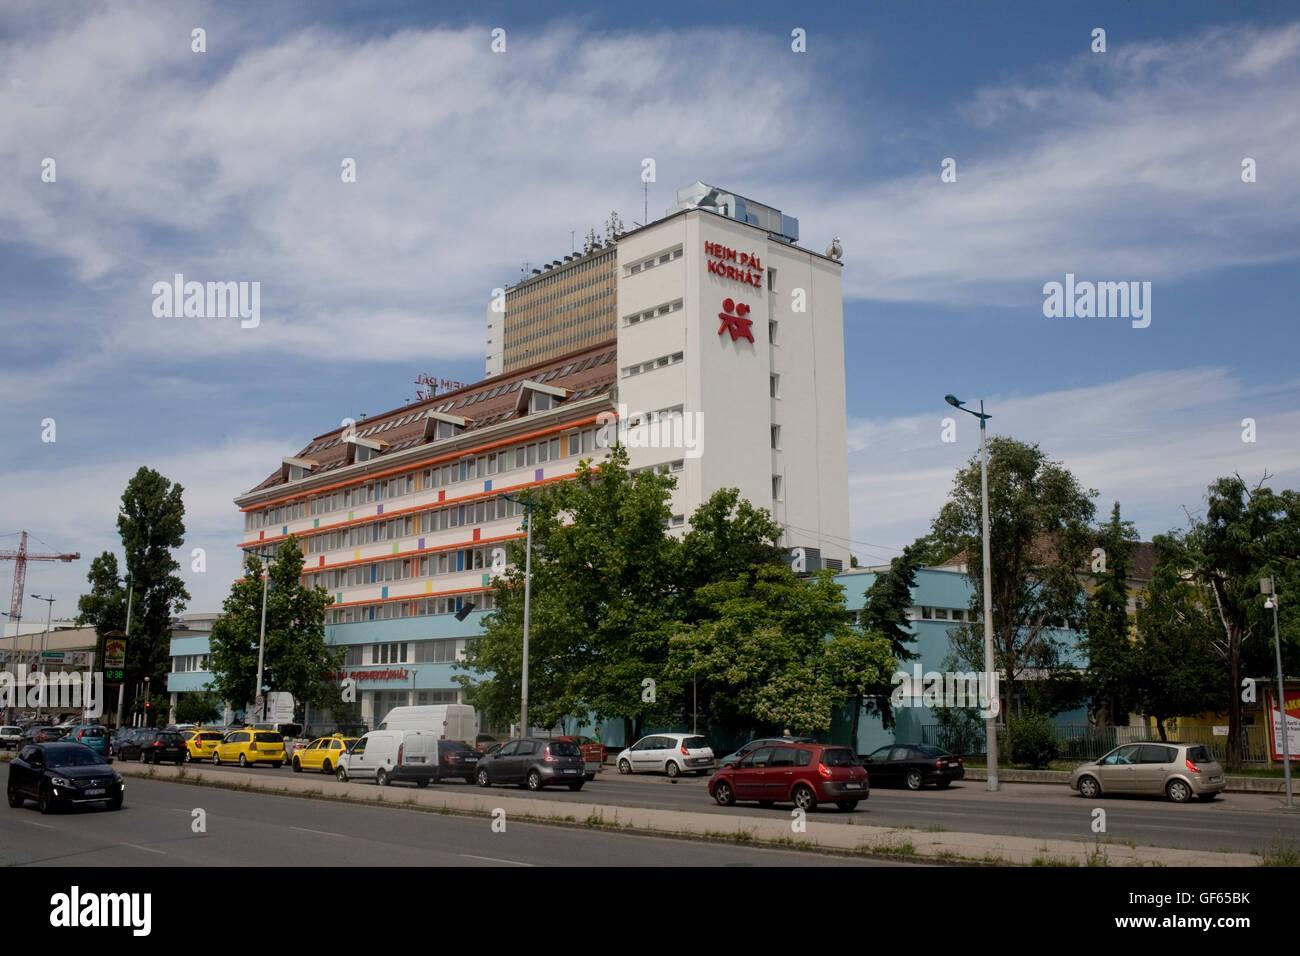 Heim Pal Korhaz apartment block on Ulloi Ut - Stock Image